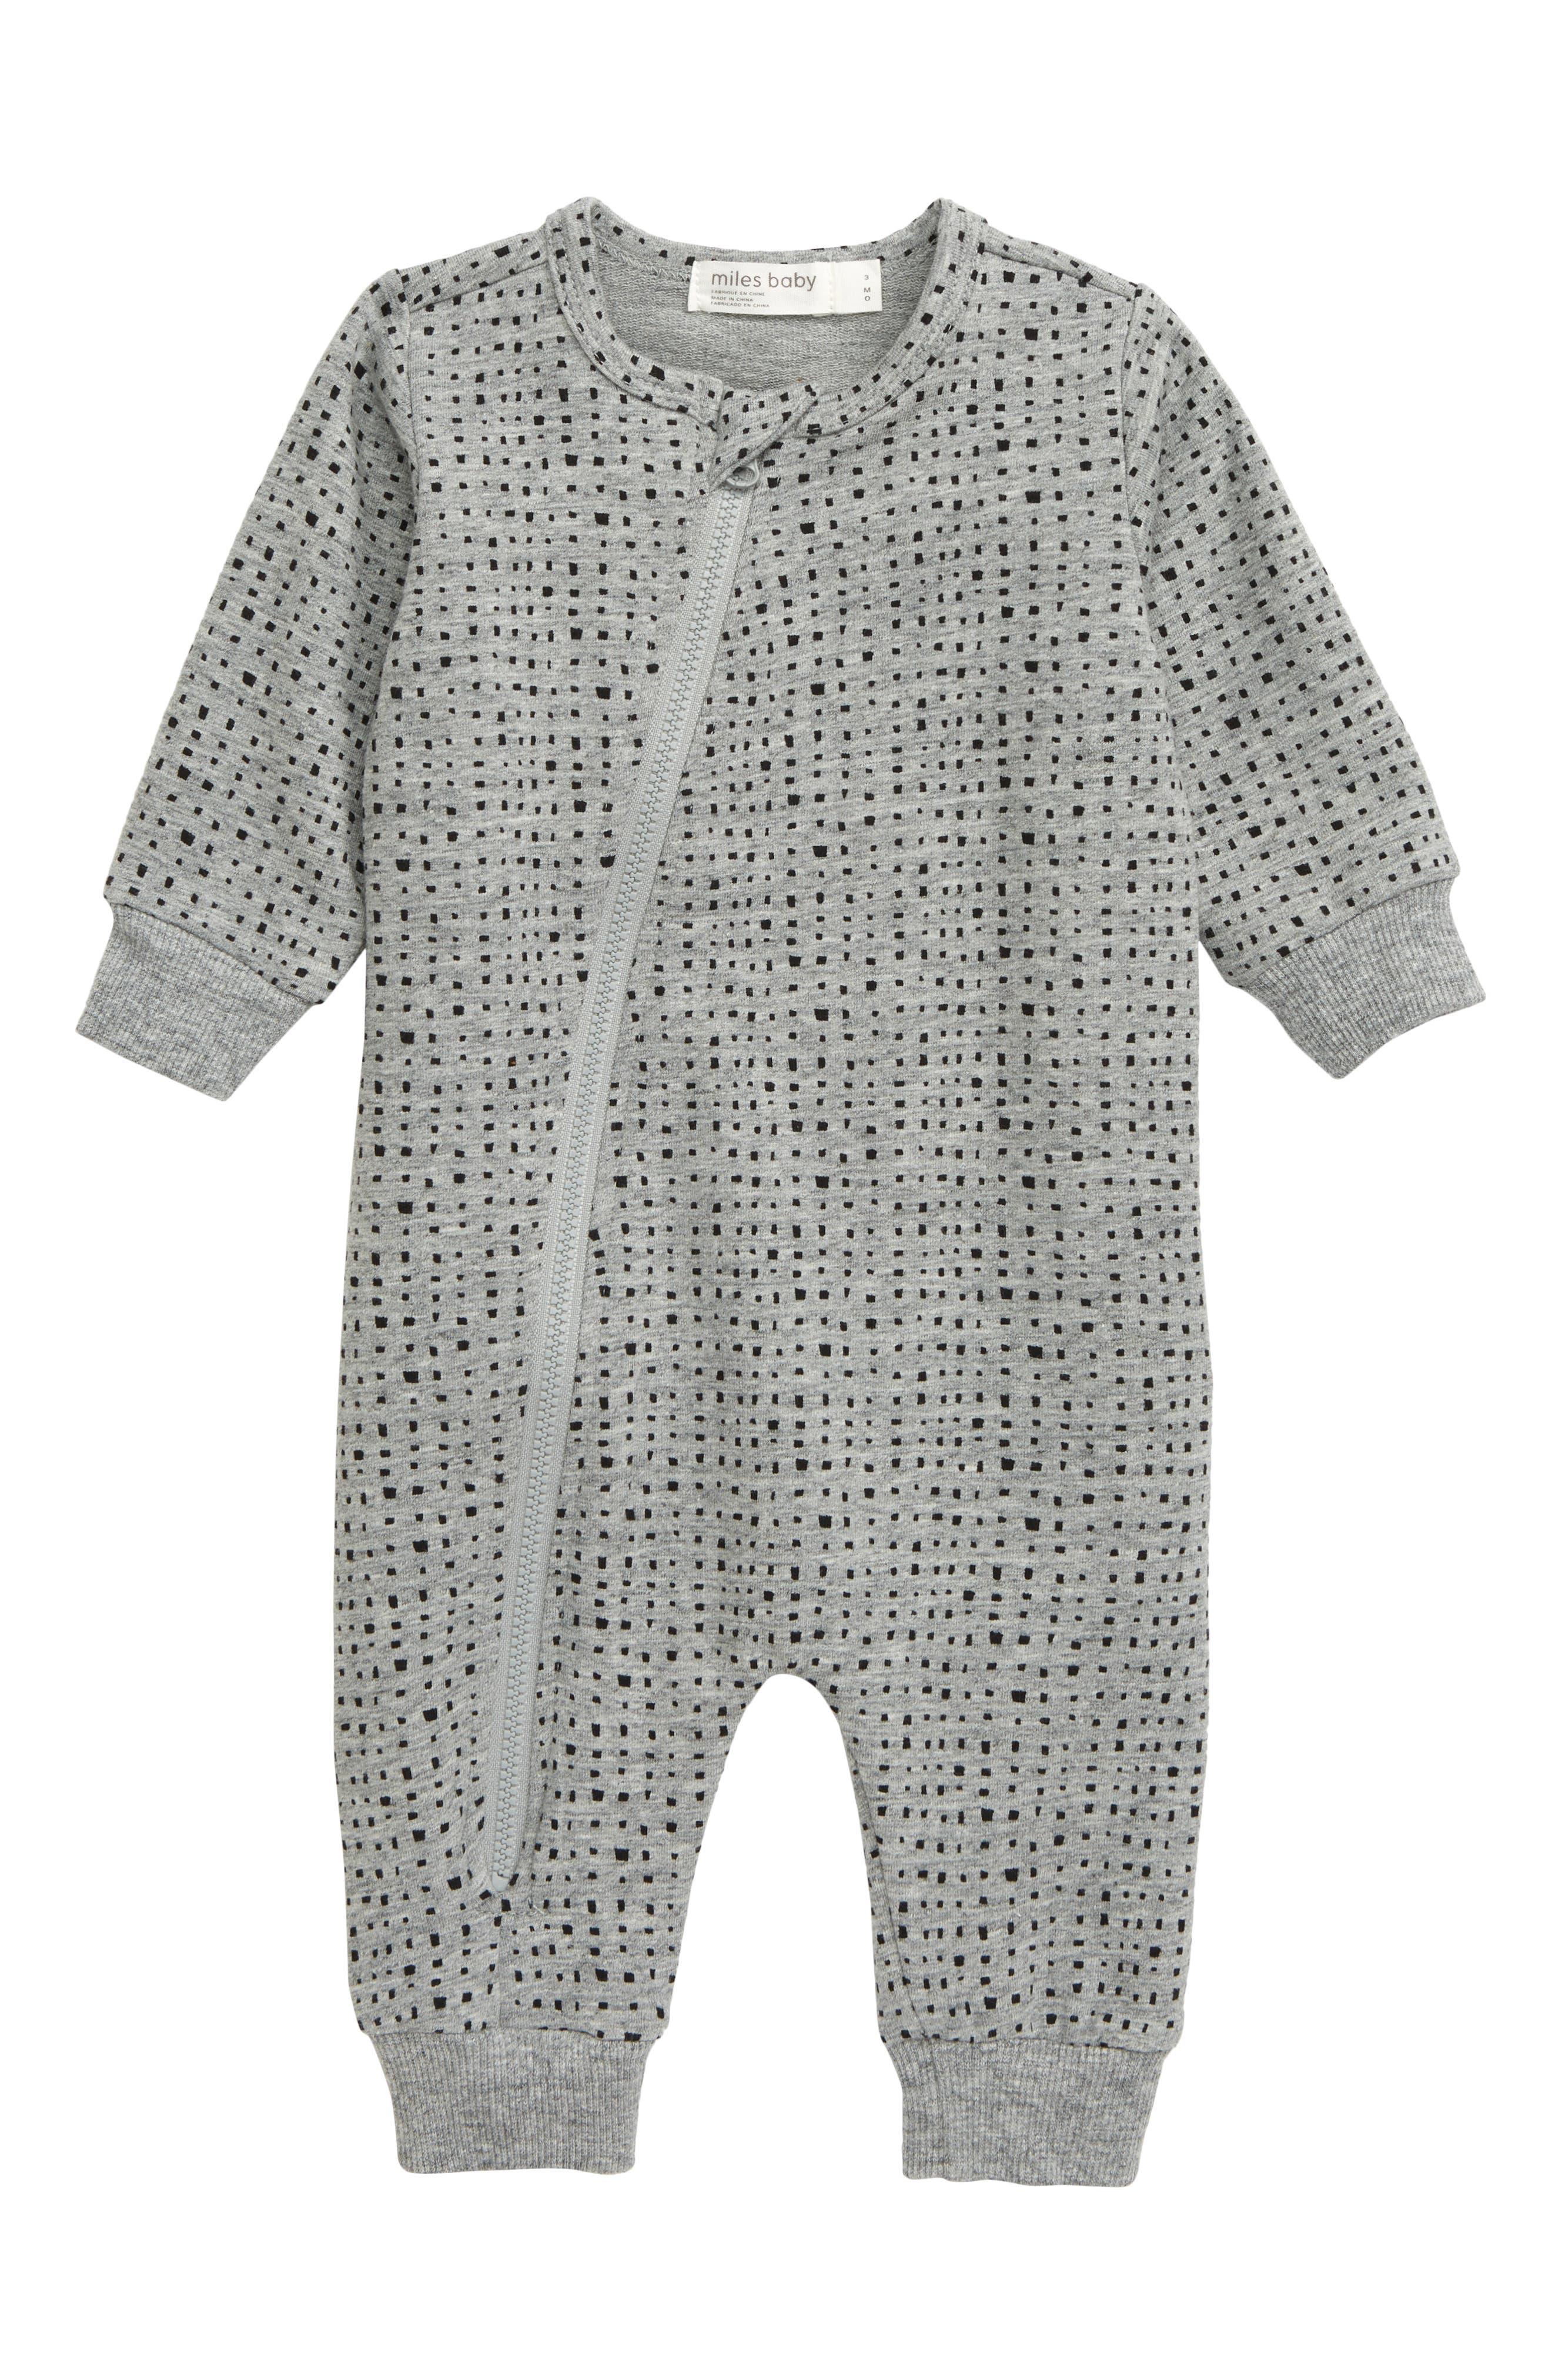 Infant Boys Miles Baby Asymmetrical Zip Romper Size 6M  Grey